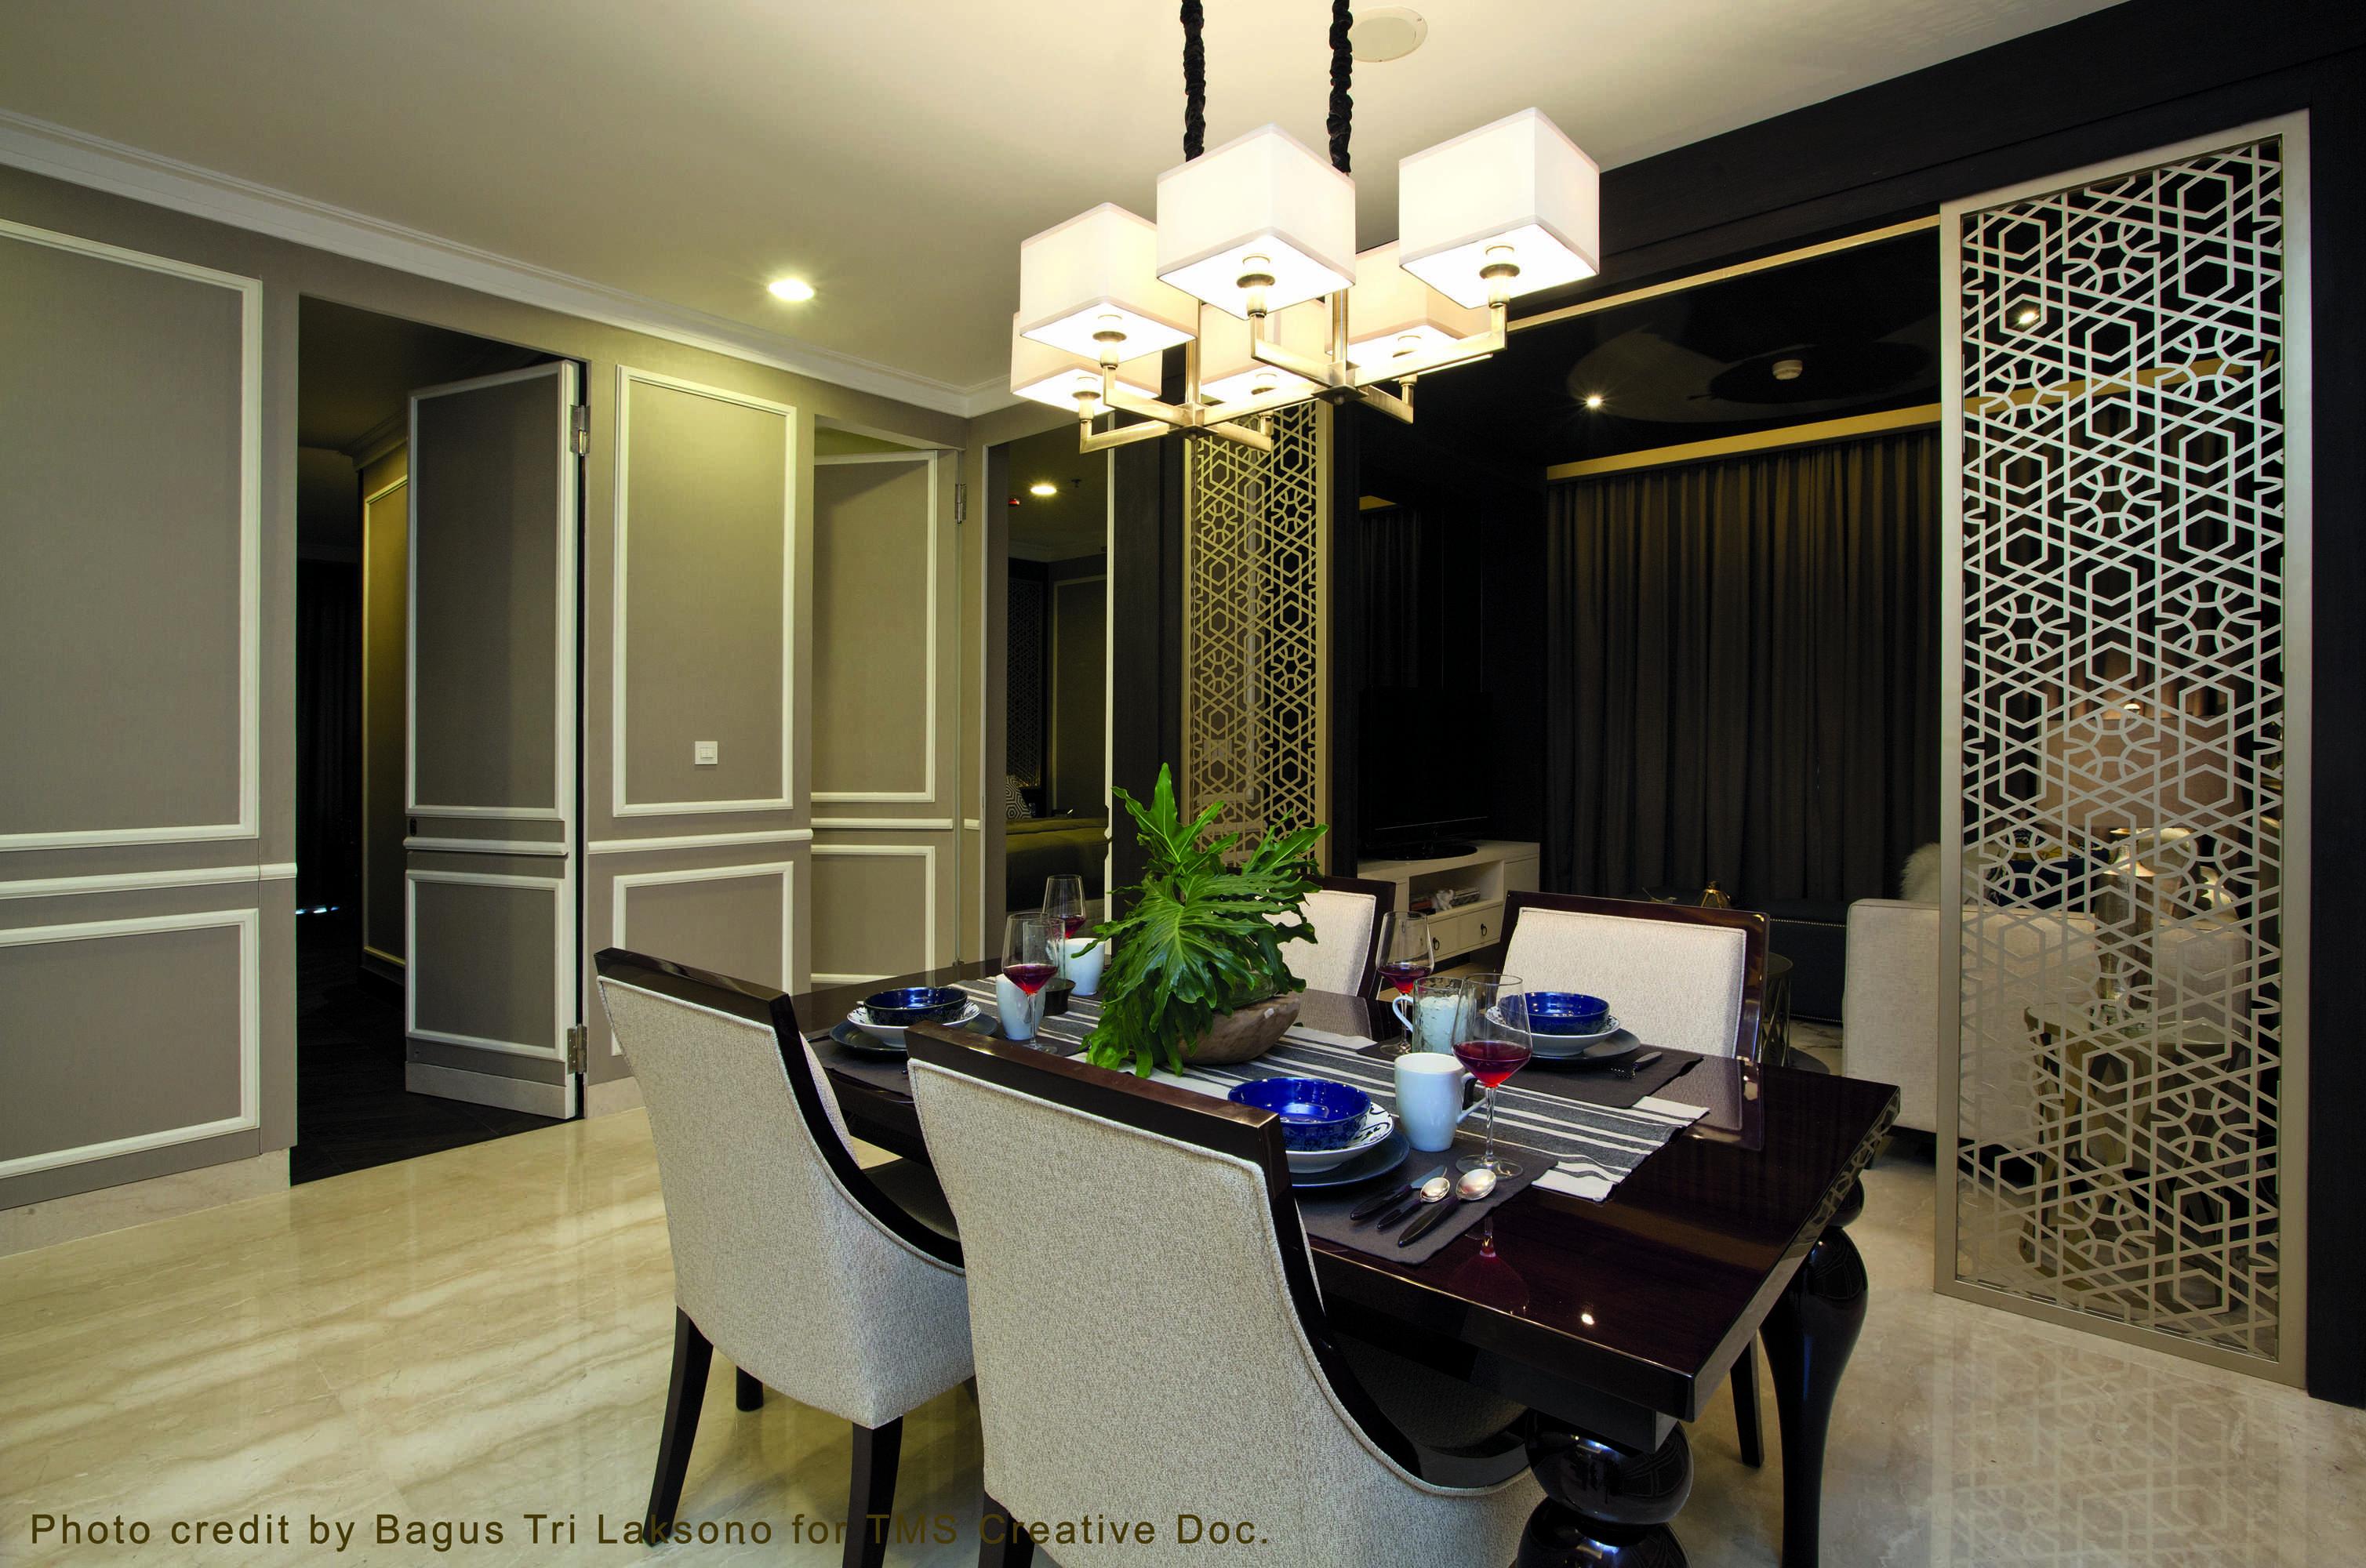 Tms Creative Residence 8 - T2 Senopati Raya No. 88 South Jakarta 12190 Senopati Raya No. 88 South Jakarta 12190 Tmsres82Bdr-05   40957